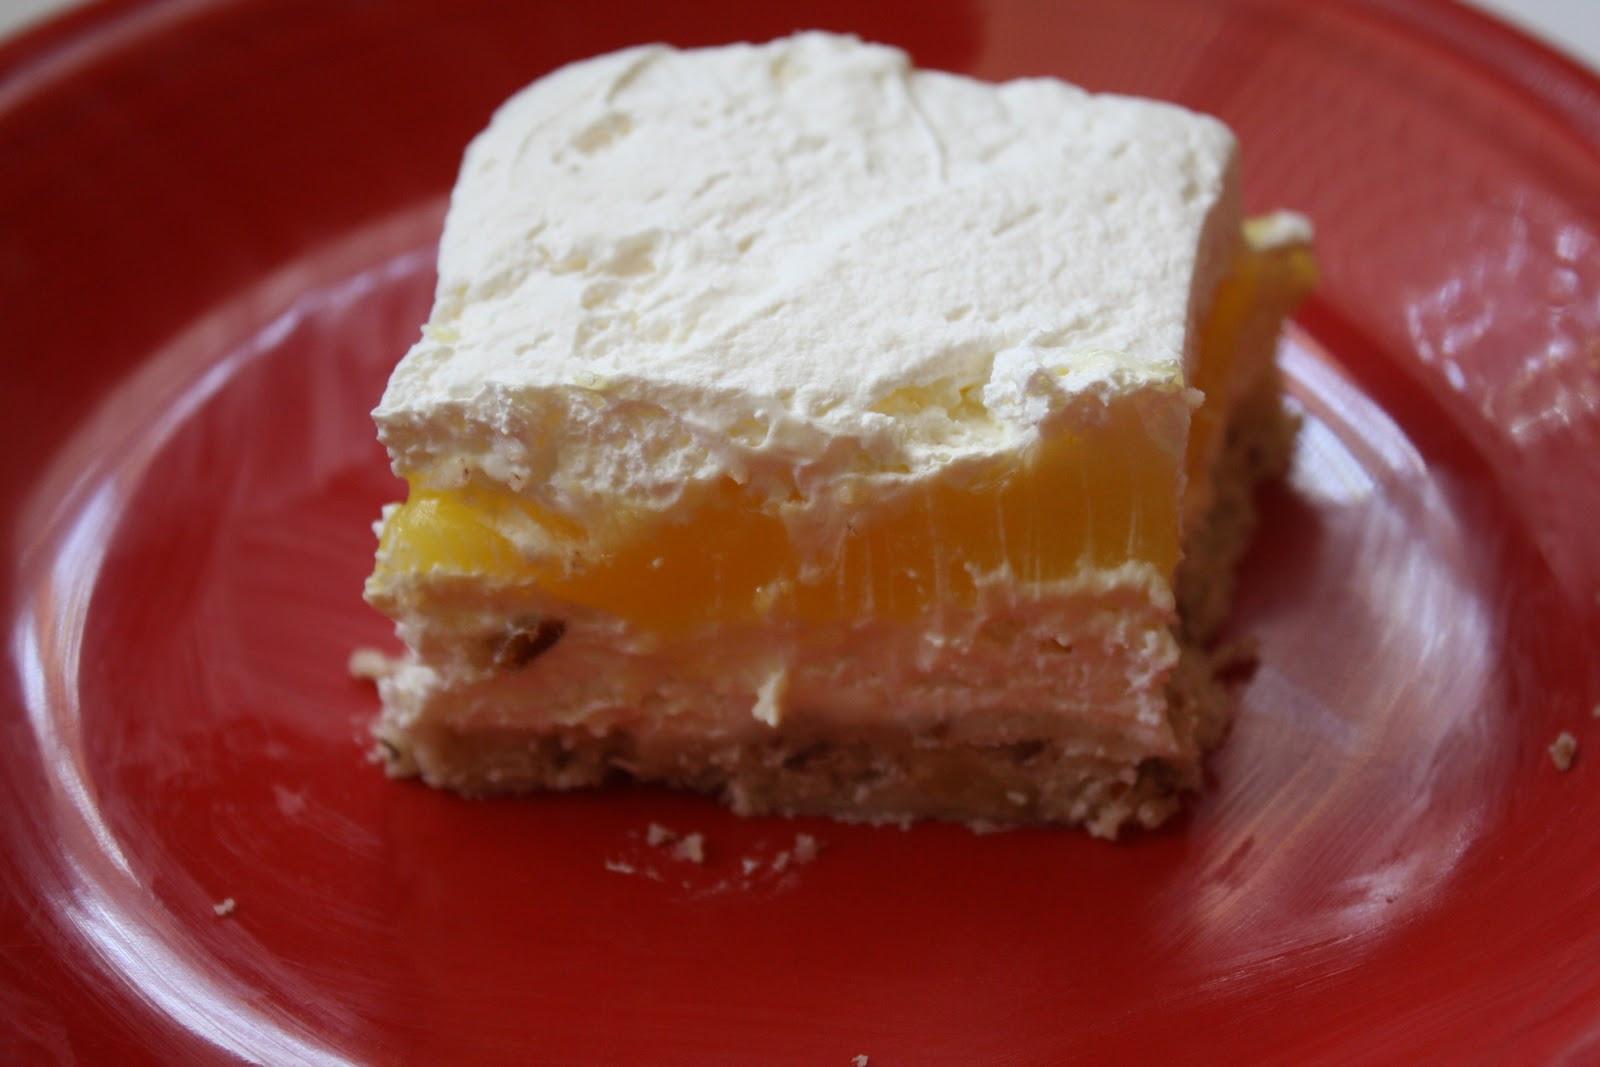 Layered Lemon Dessert  The Link Home layered lemon dessert